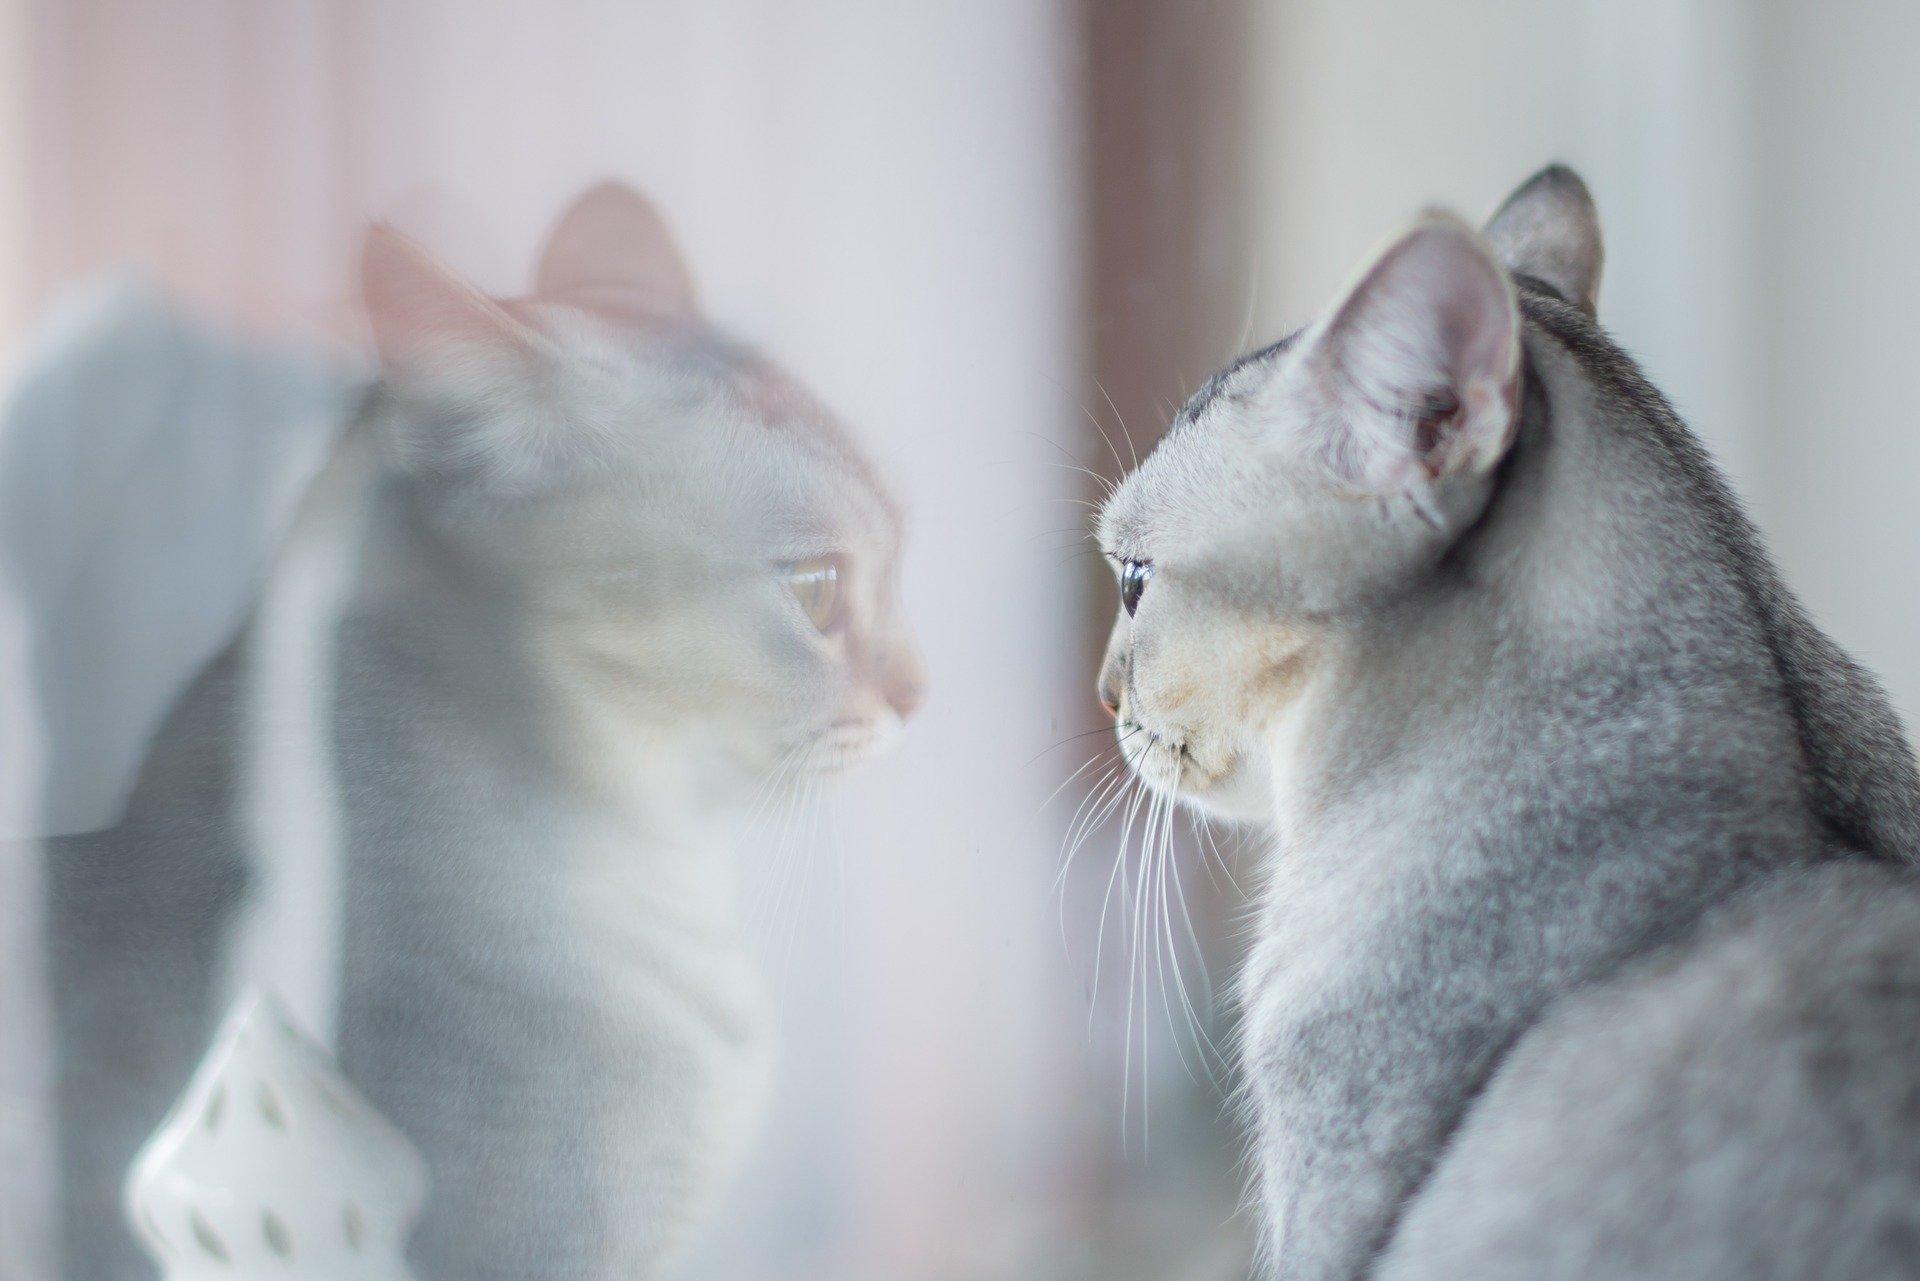 Kissa katsoo omaa kuvajaistaan. Pexels.